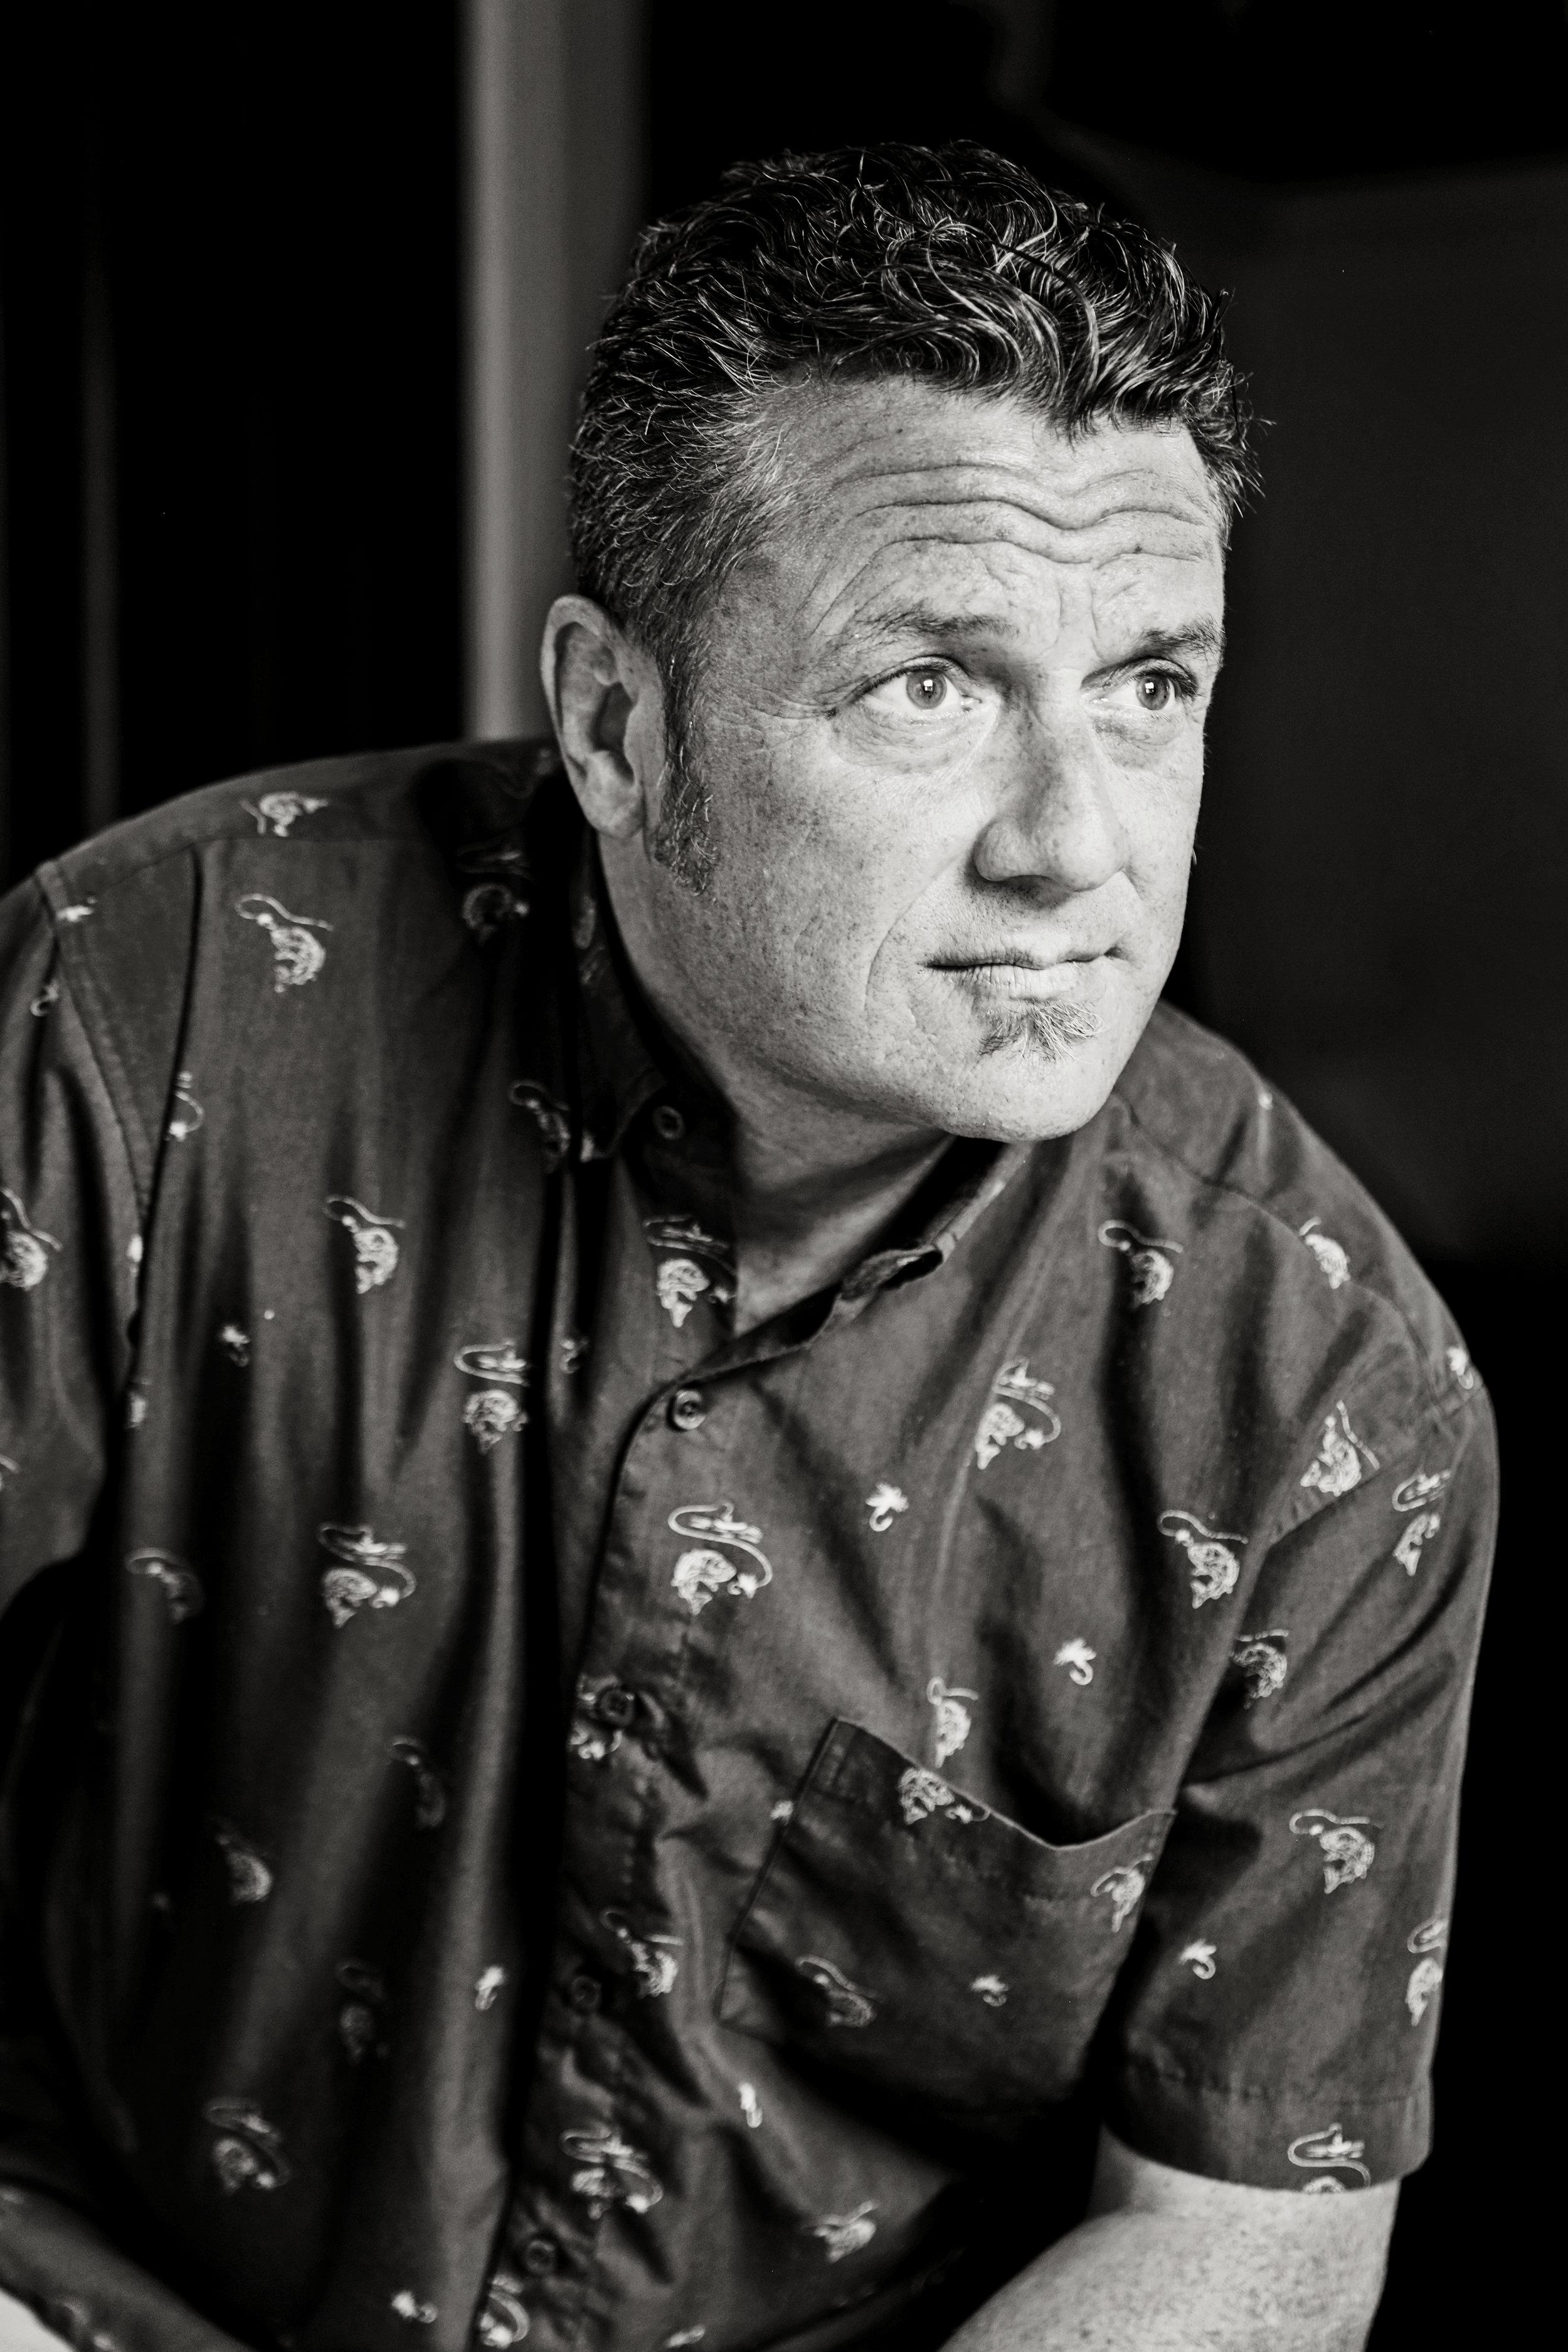 Mike Wyndhamsmith